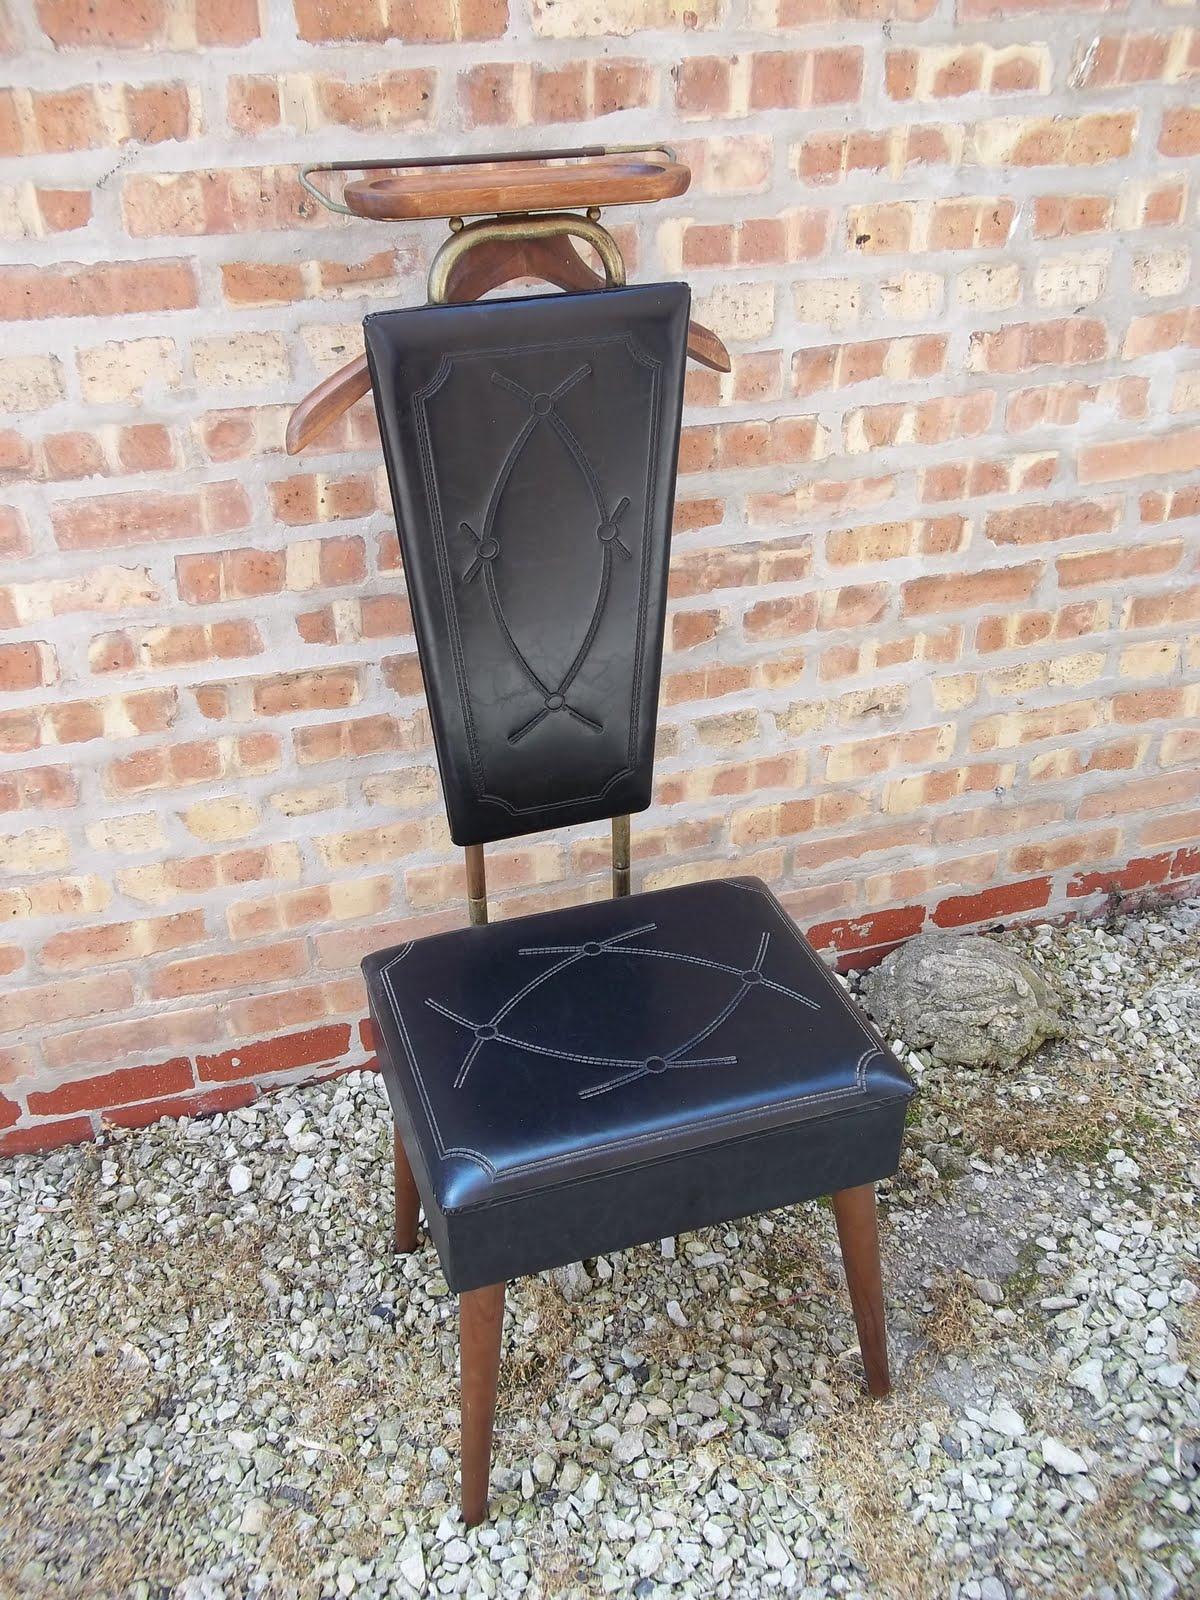 Mens Valet Chair Wooden Bar Stool Chairs Nova Mid Century Black Vinyl With Storage